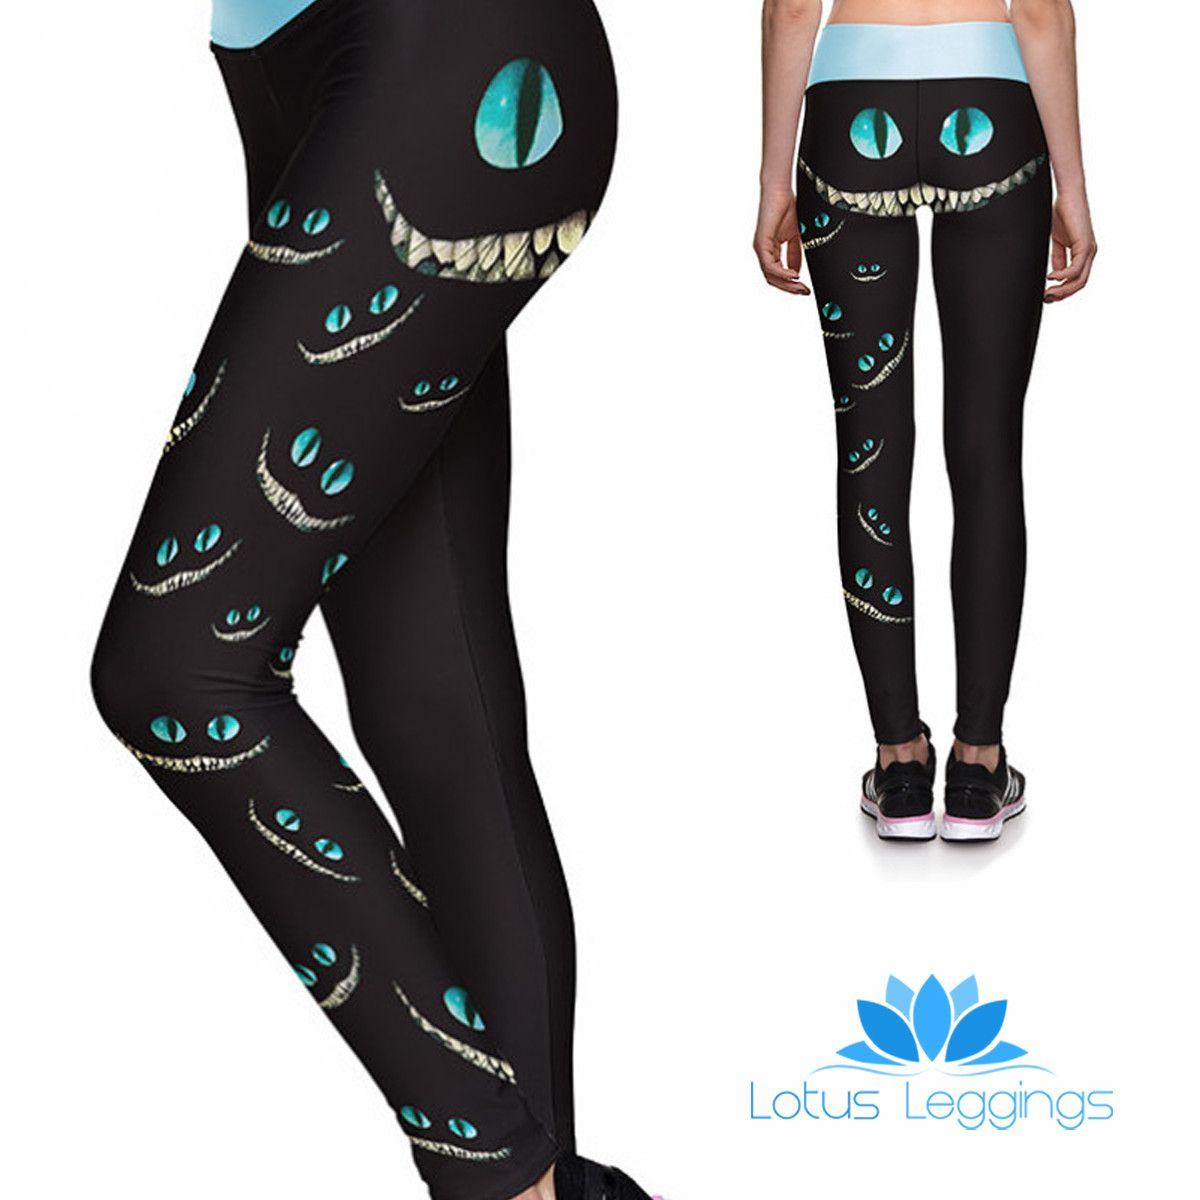 3794848610ec12 Mad here athletic leggings | fashion* | Leggings, Cheshire cat ...